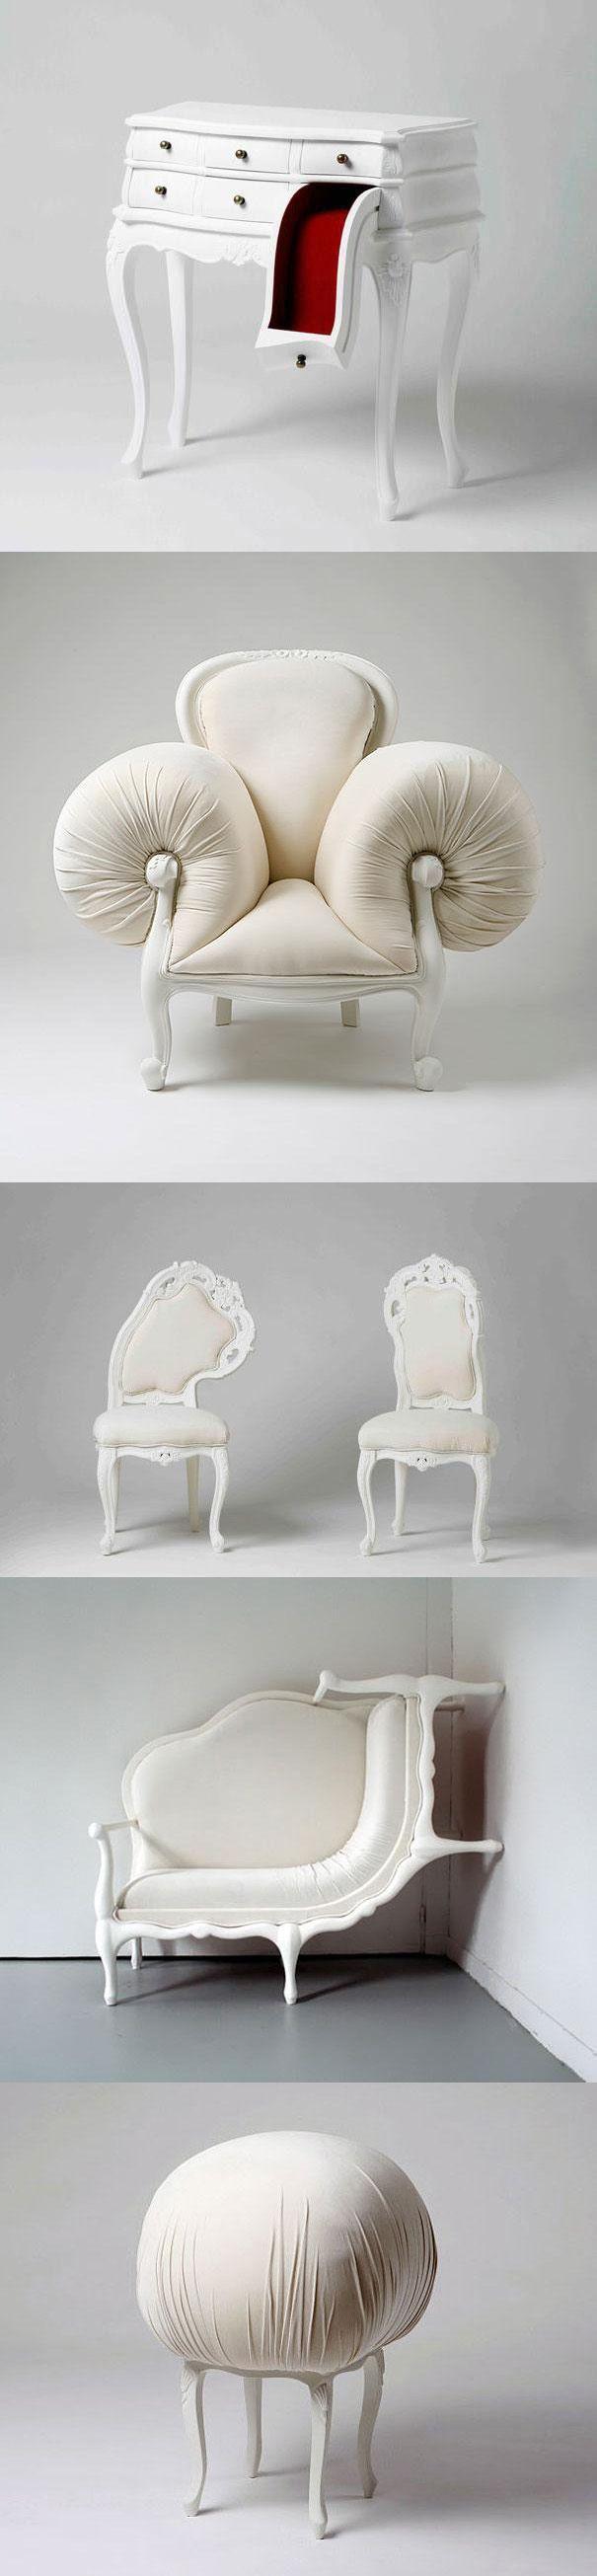 5 Beautiful Things Furniture DesignUnusual FurnitureFunny FurnitureCool